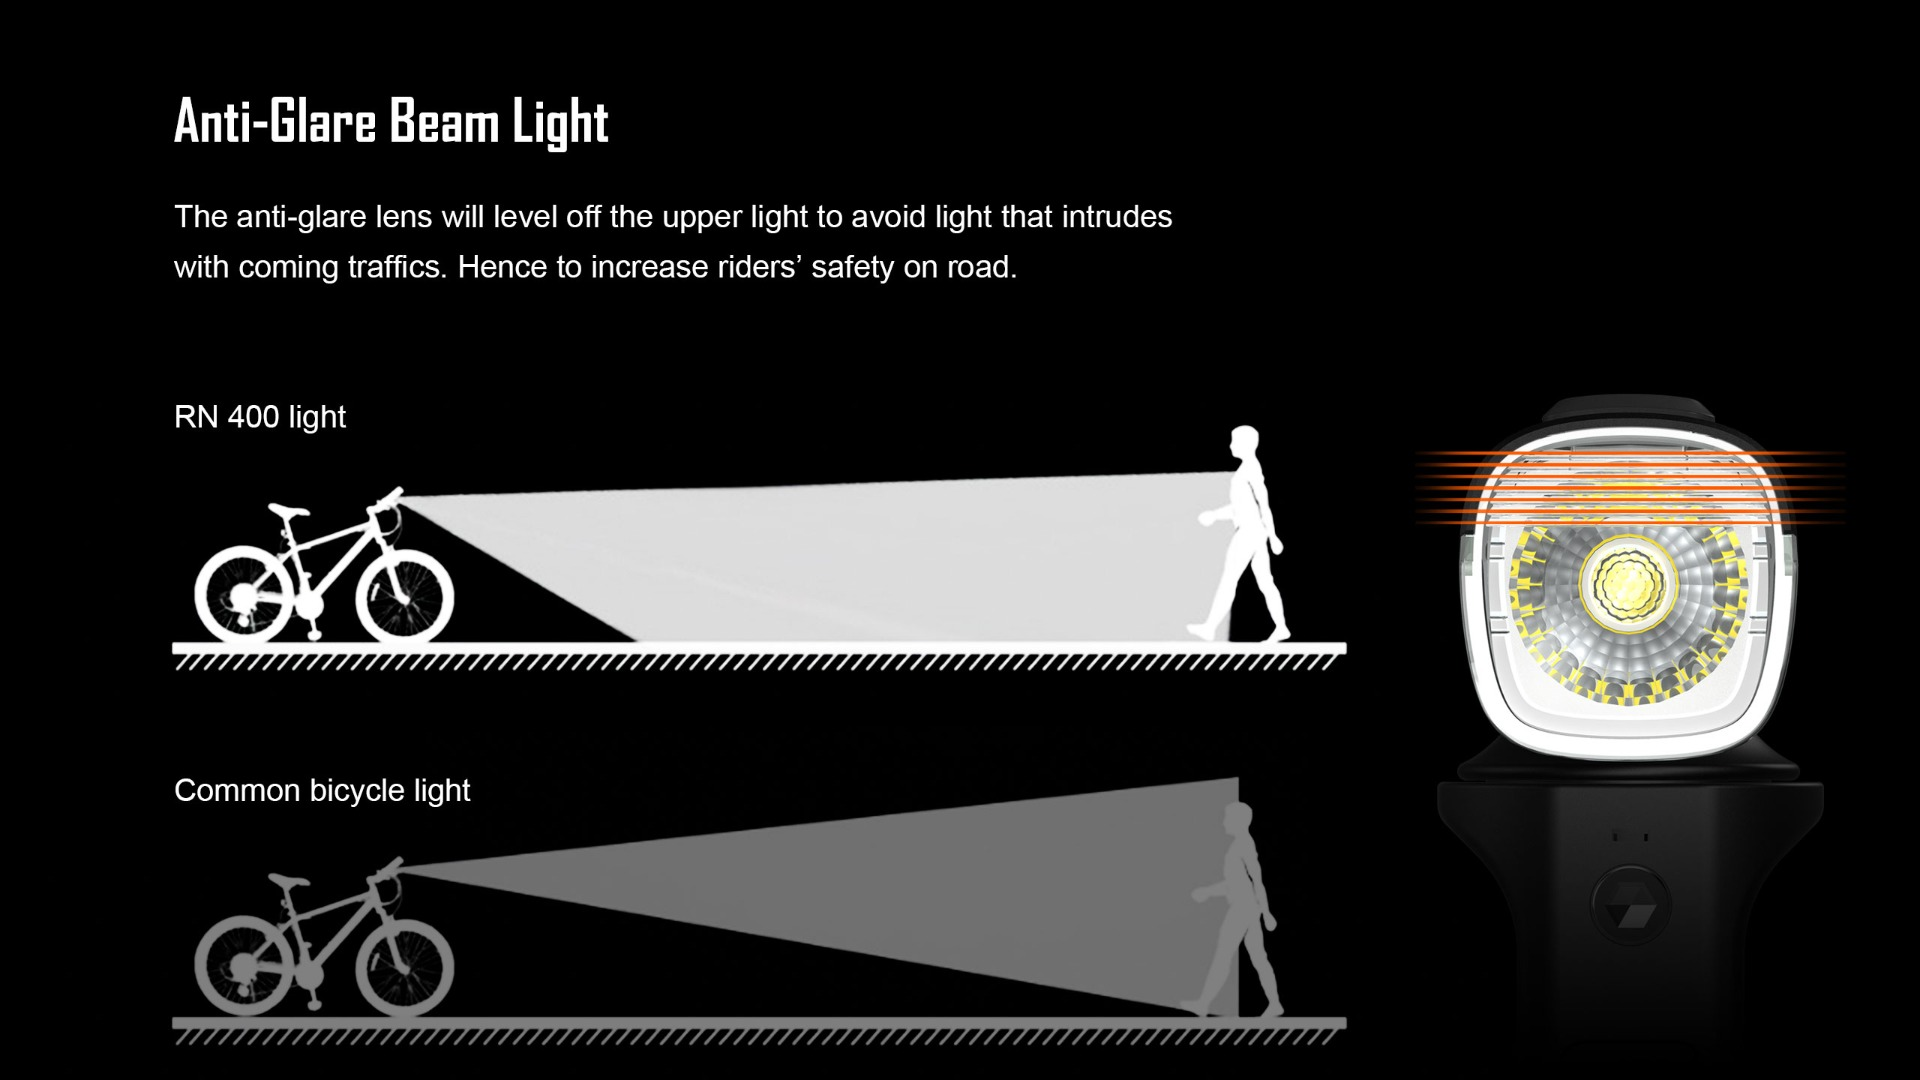 Olight RN 400 Bike LED Light Headlight Anti-Glare Beam Light